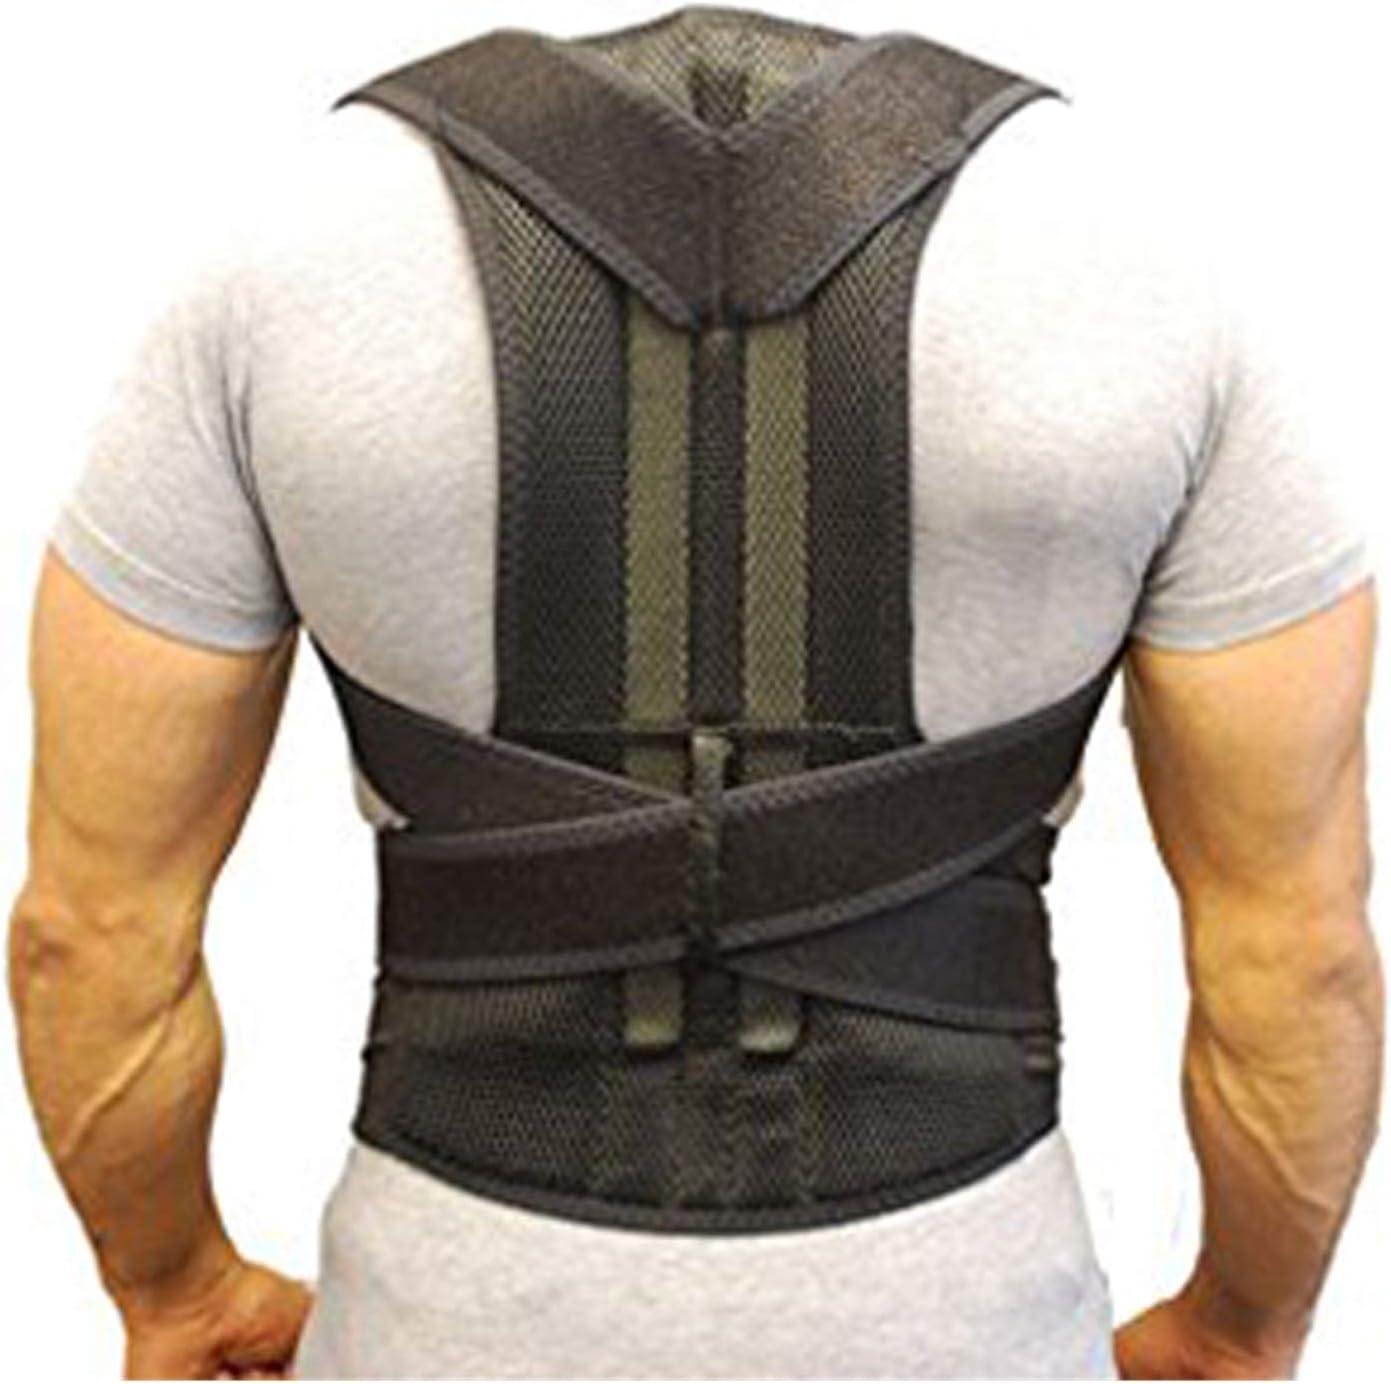 JBIVWW Animer and price revision KJACR 4 years warranty Adjustable Posture Corrector Men Orthopedic Wom